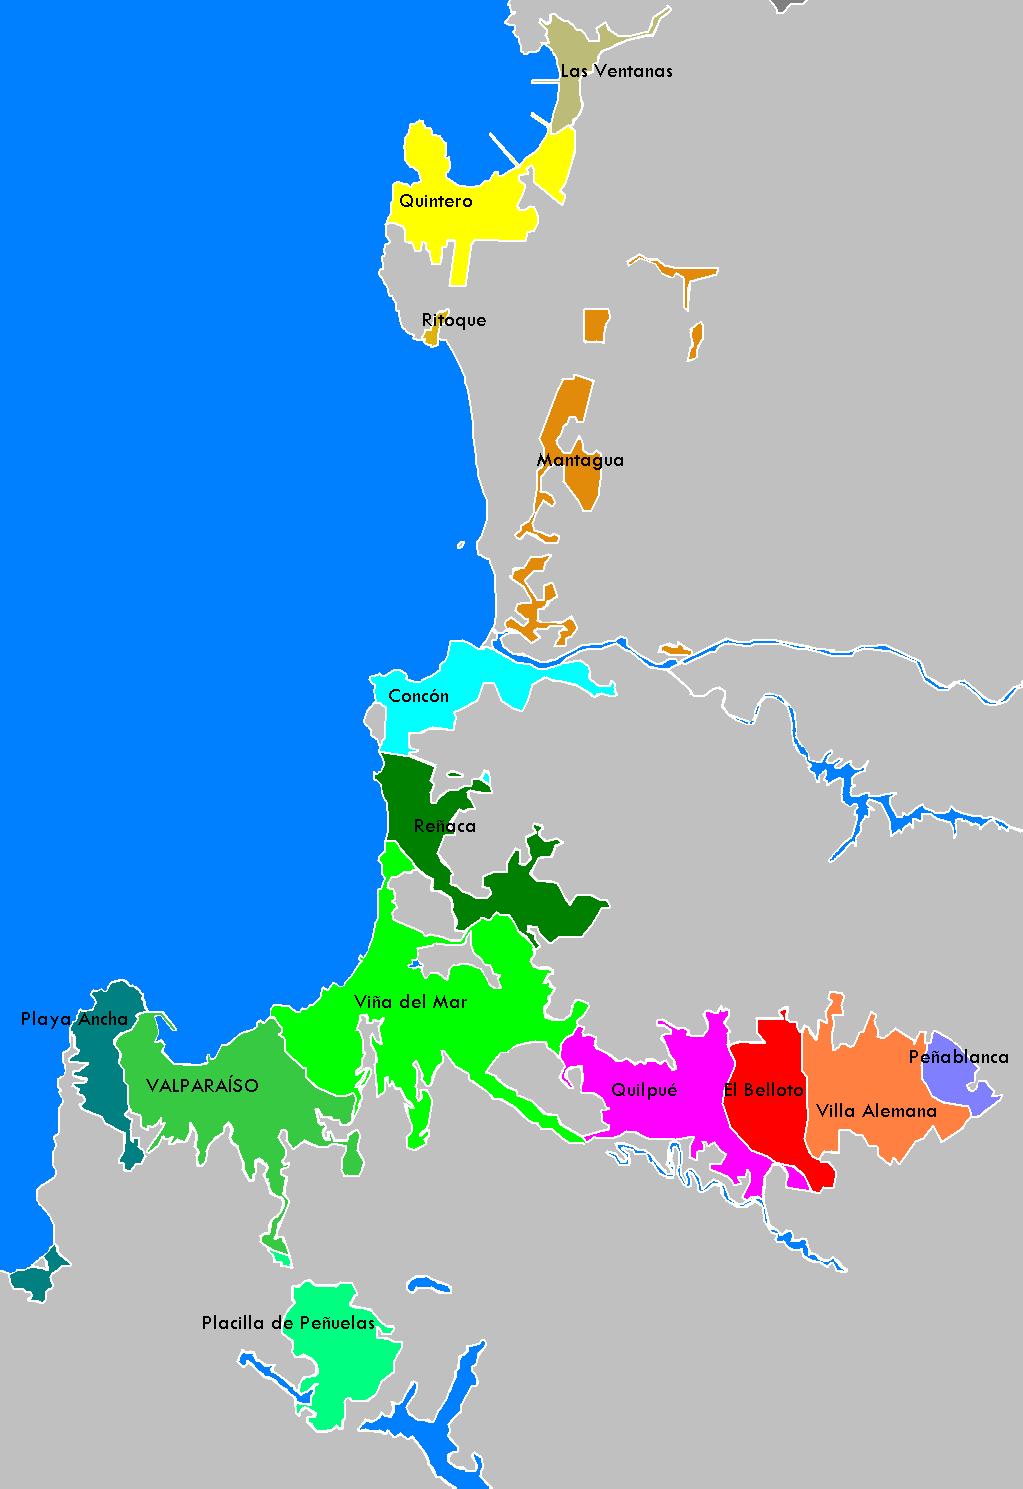 FileGran valparaiso 2012PNG Wikimedia Commons